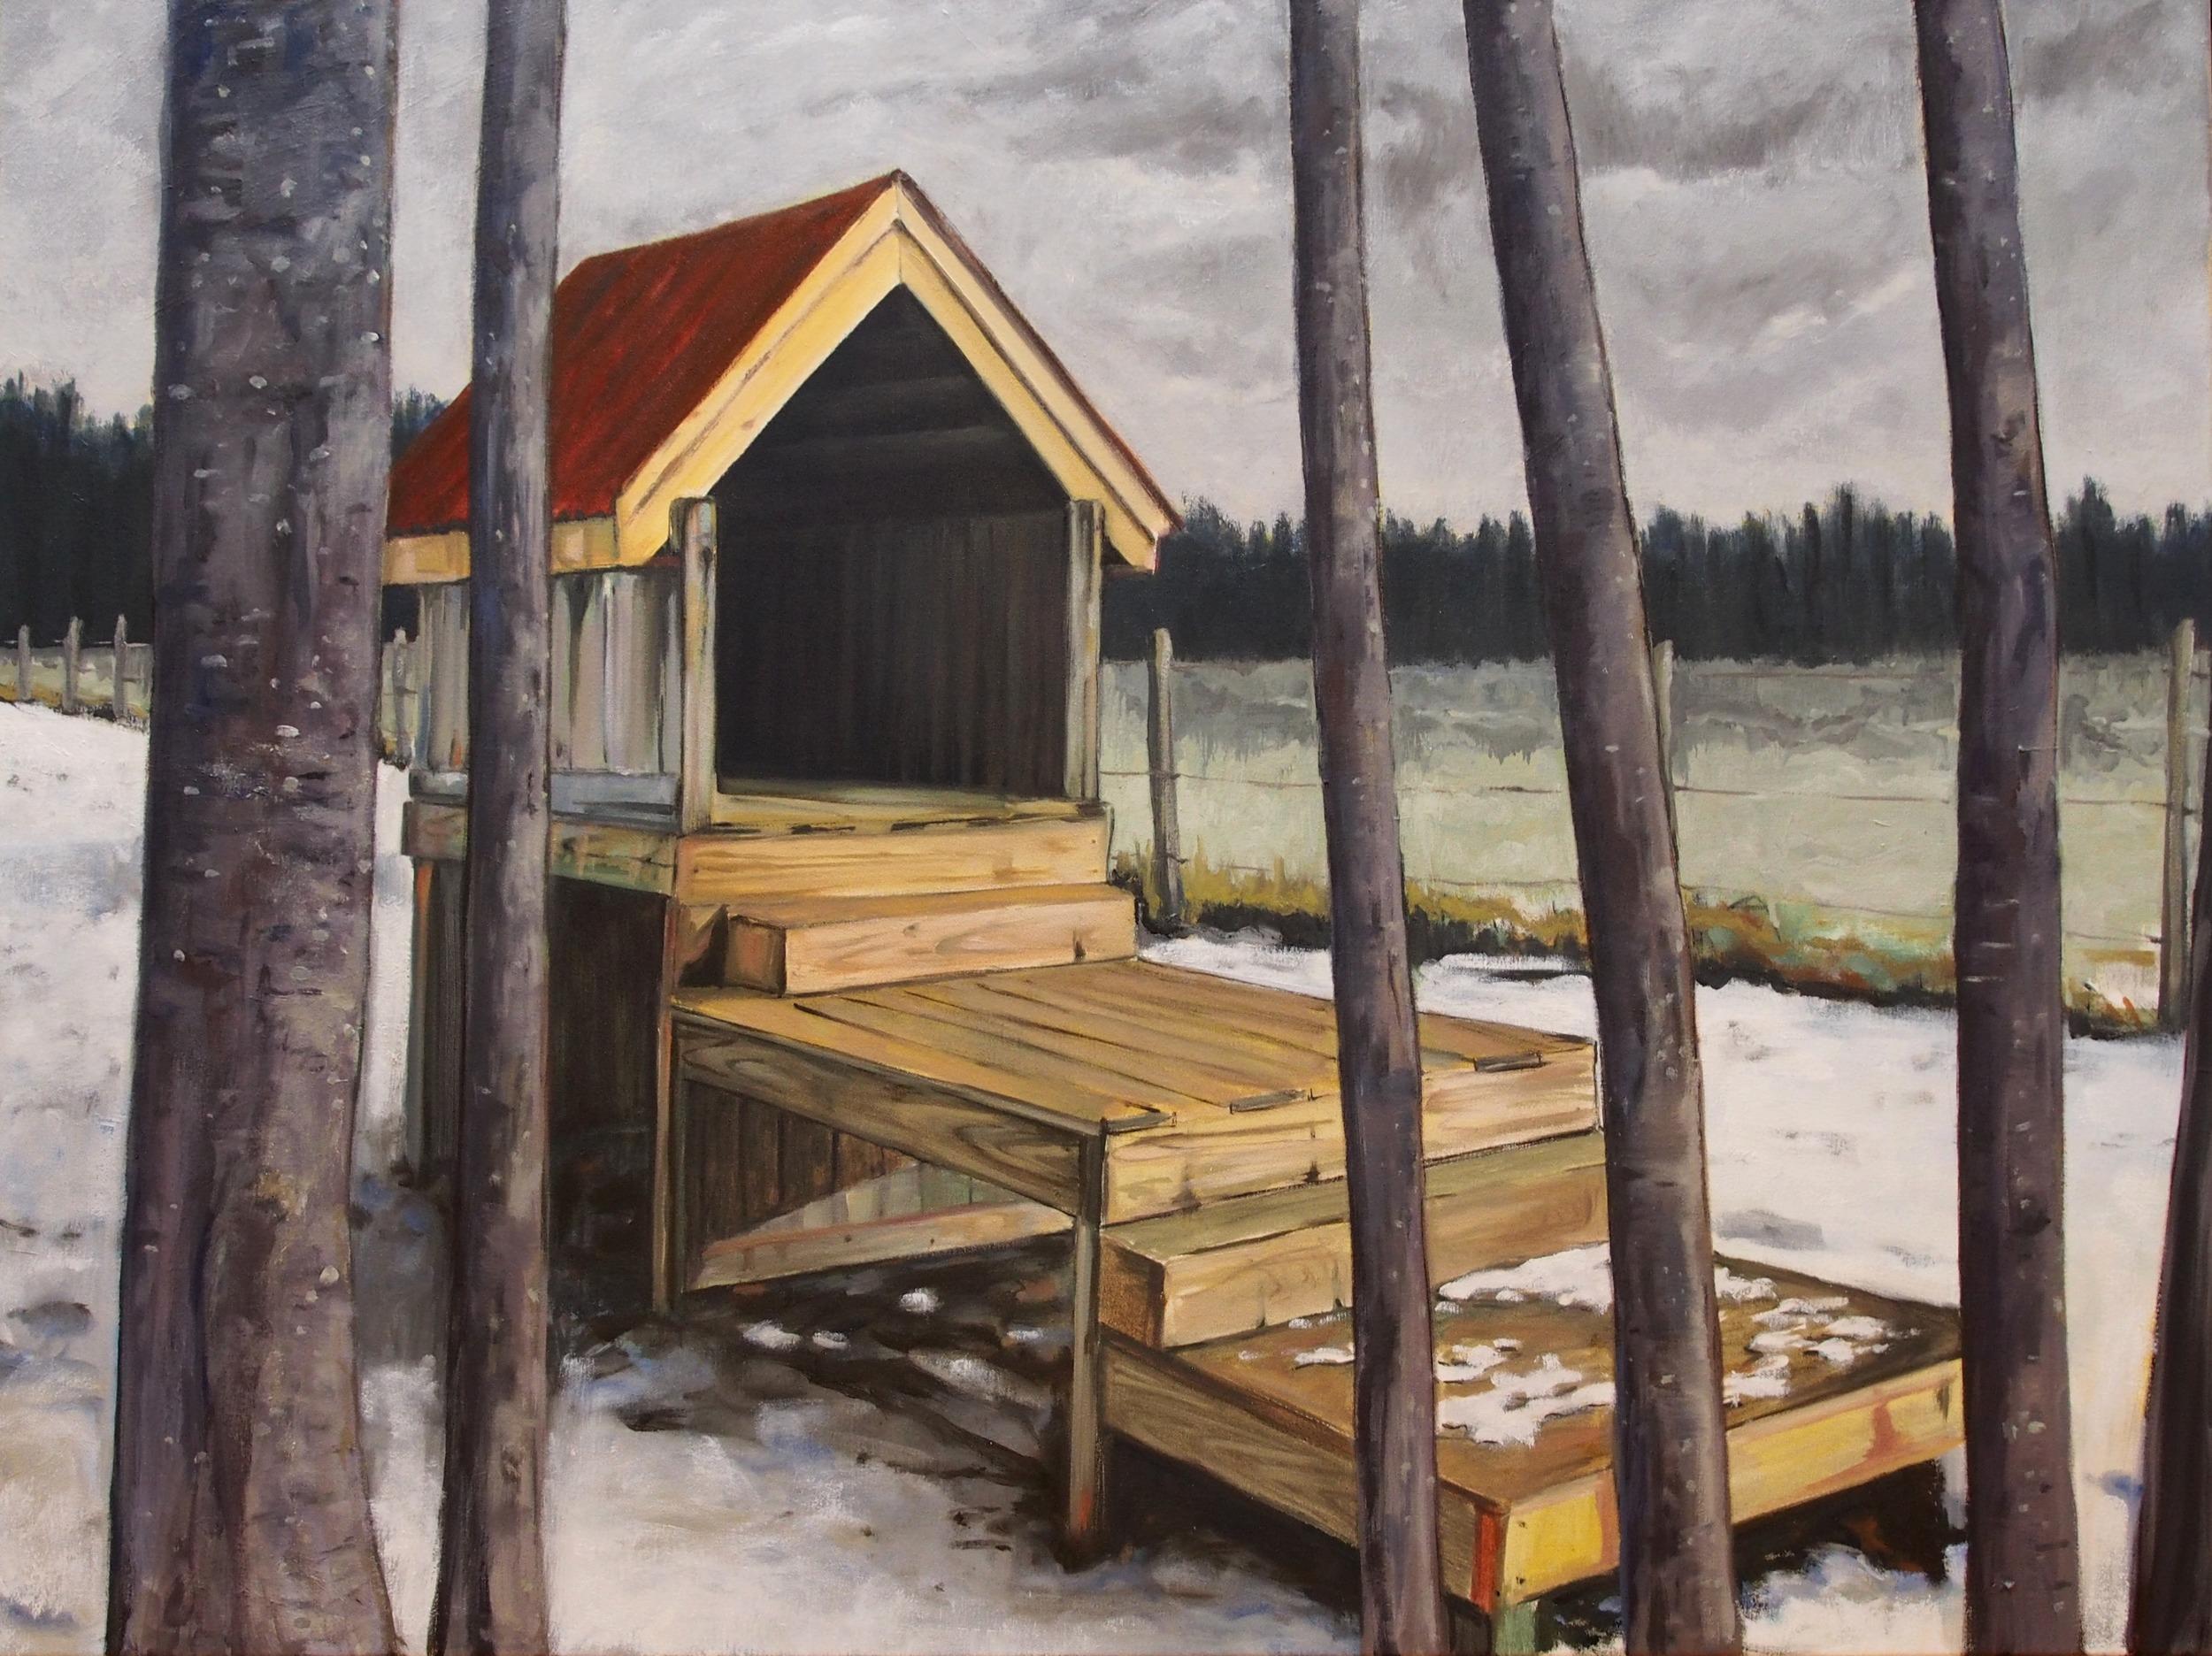 Abel's Rest,  2013-14 Oil on canvas 84 x 112 cm